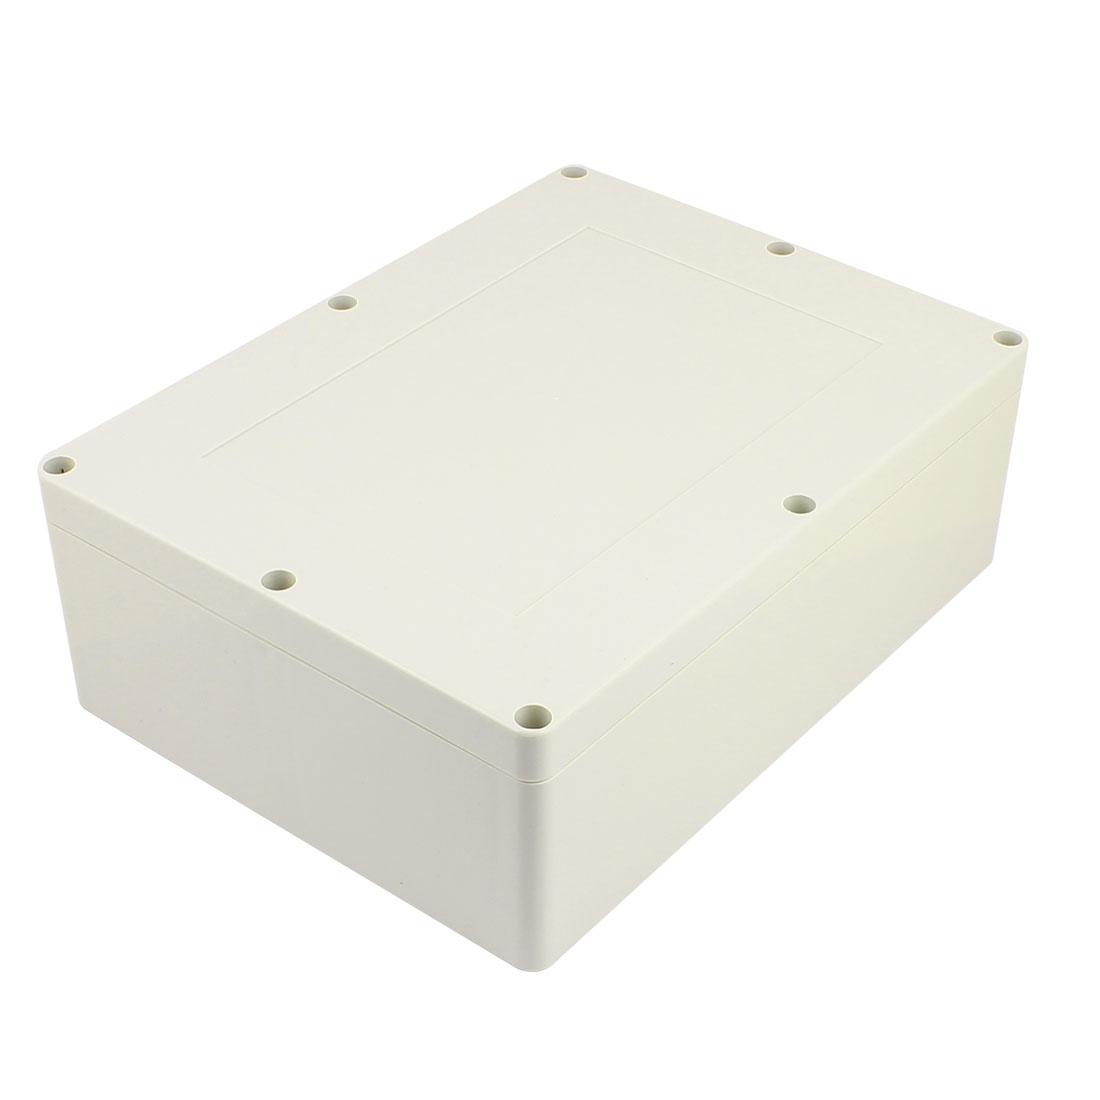 Dustproof IP65 Junction Box DIY Terminal Connection Enclosure Adaptable 312mm x 232mm x 102mm